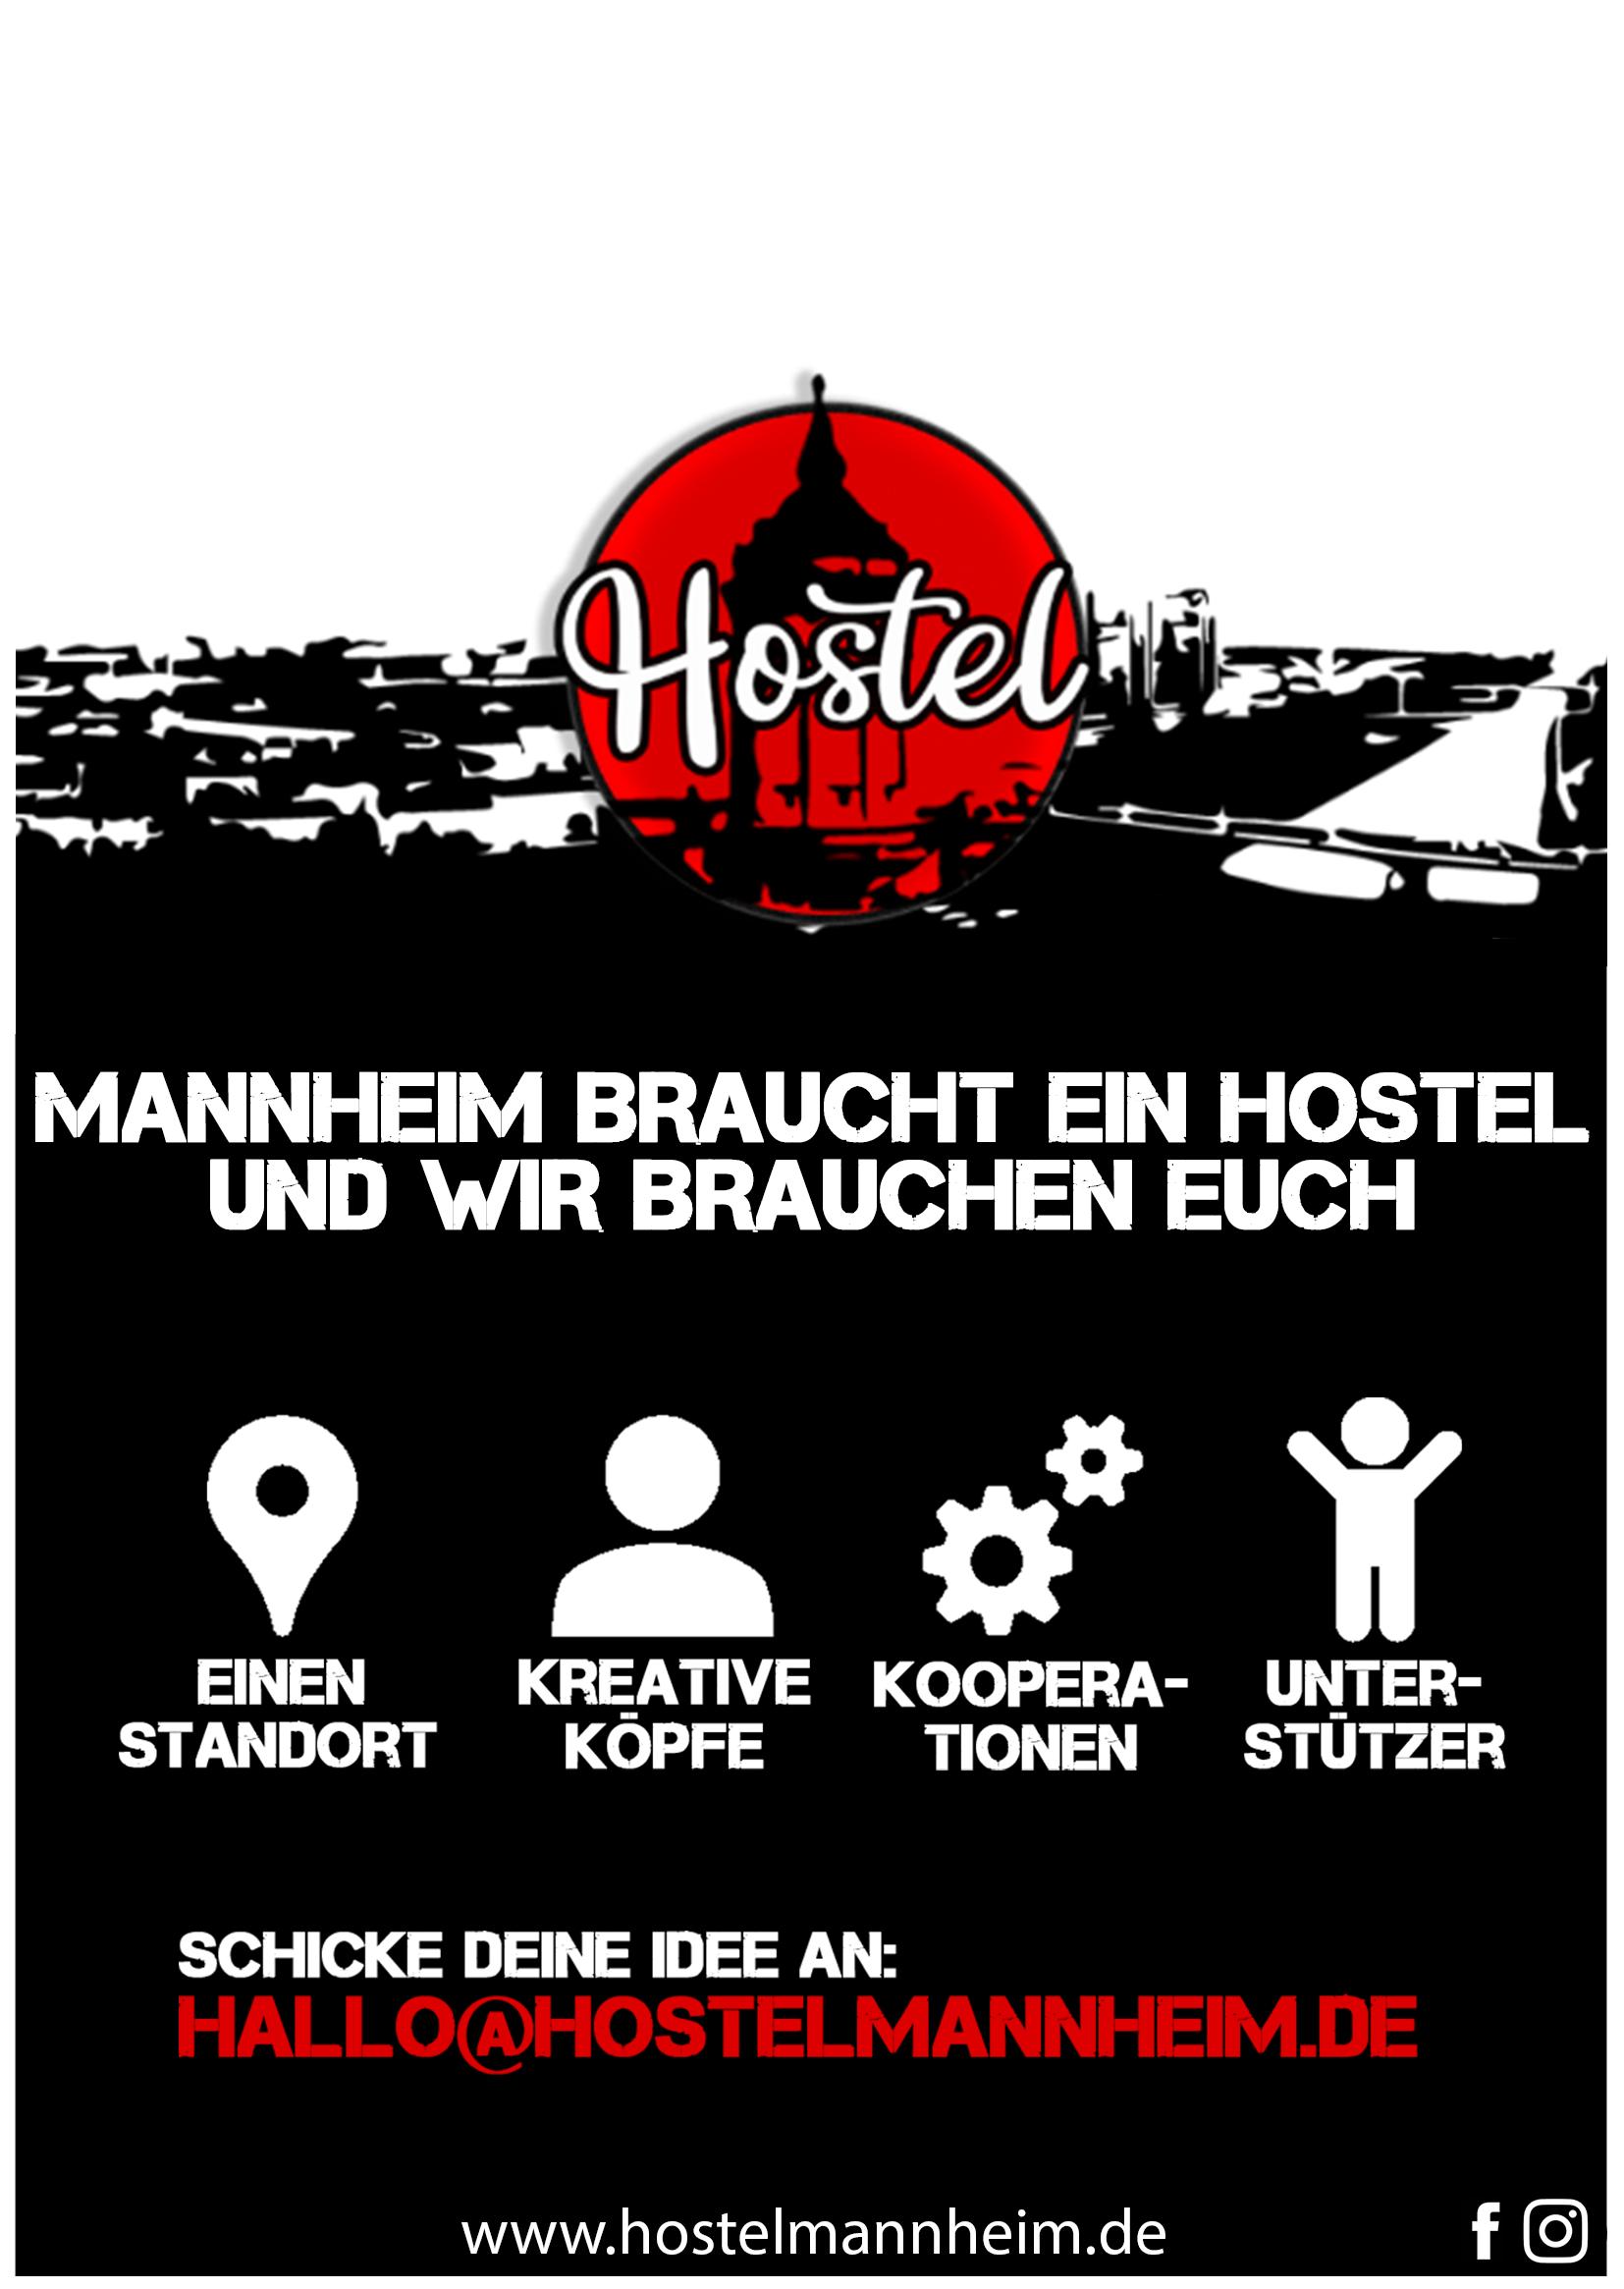 Hostel Mannheim